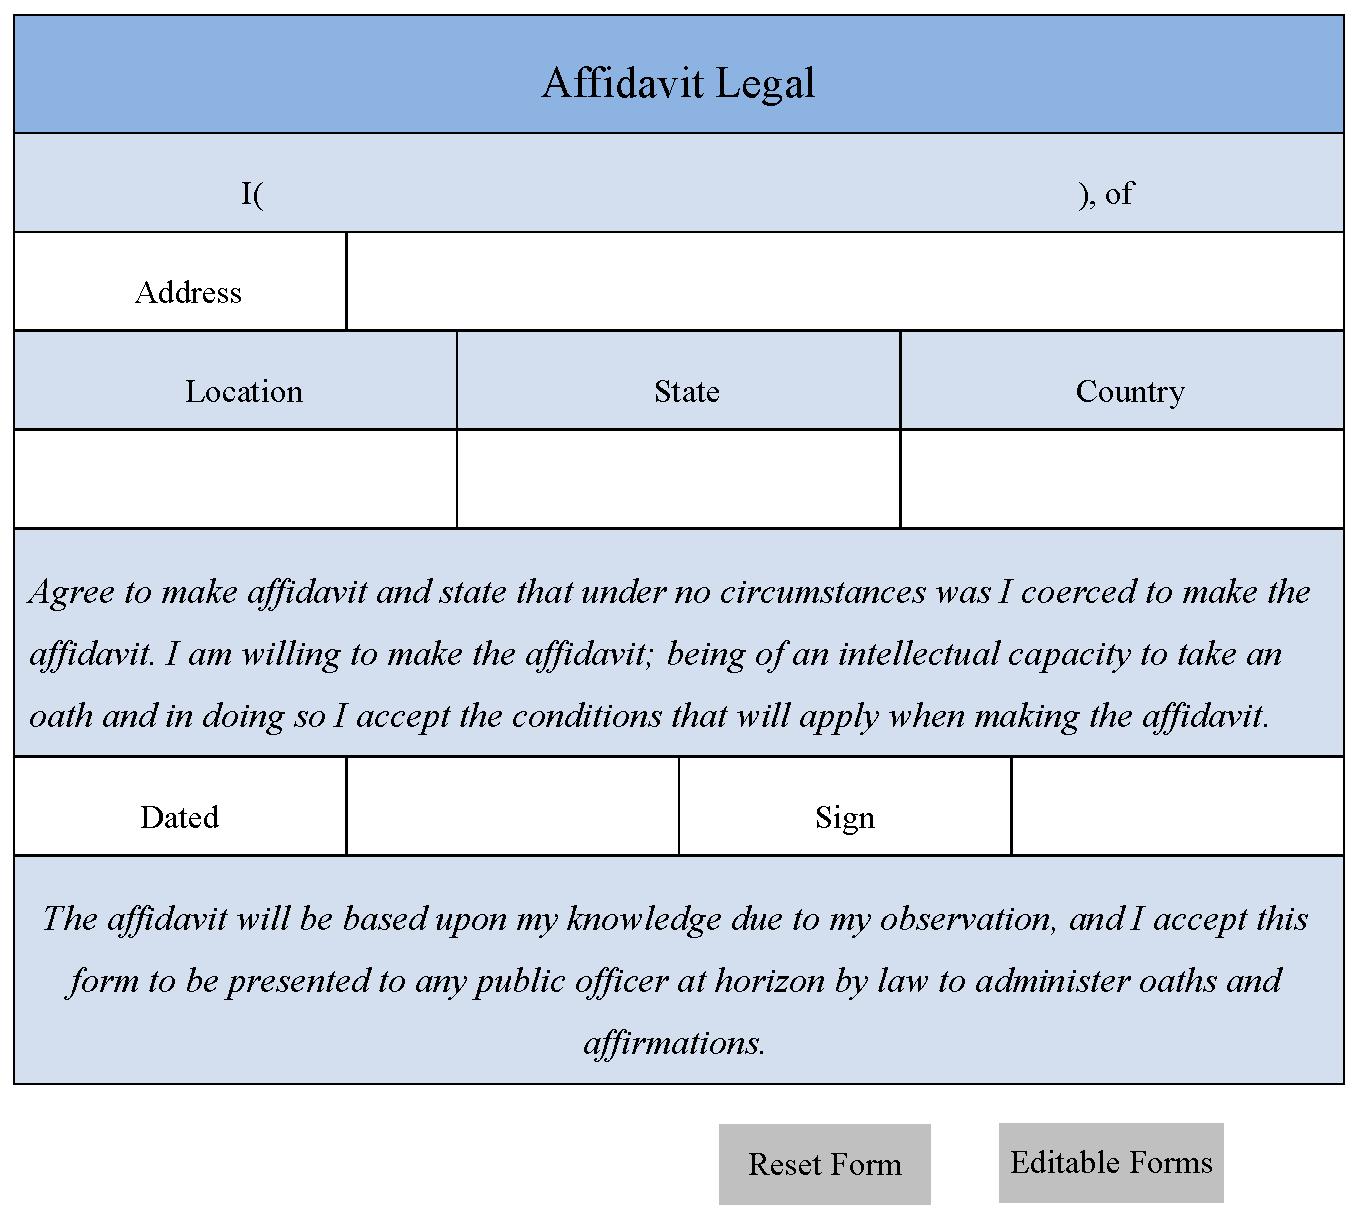 Free Affidavit Form Template free blank forms spreadsheet – Free Affidavit Form Template